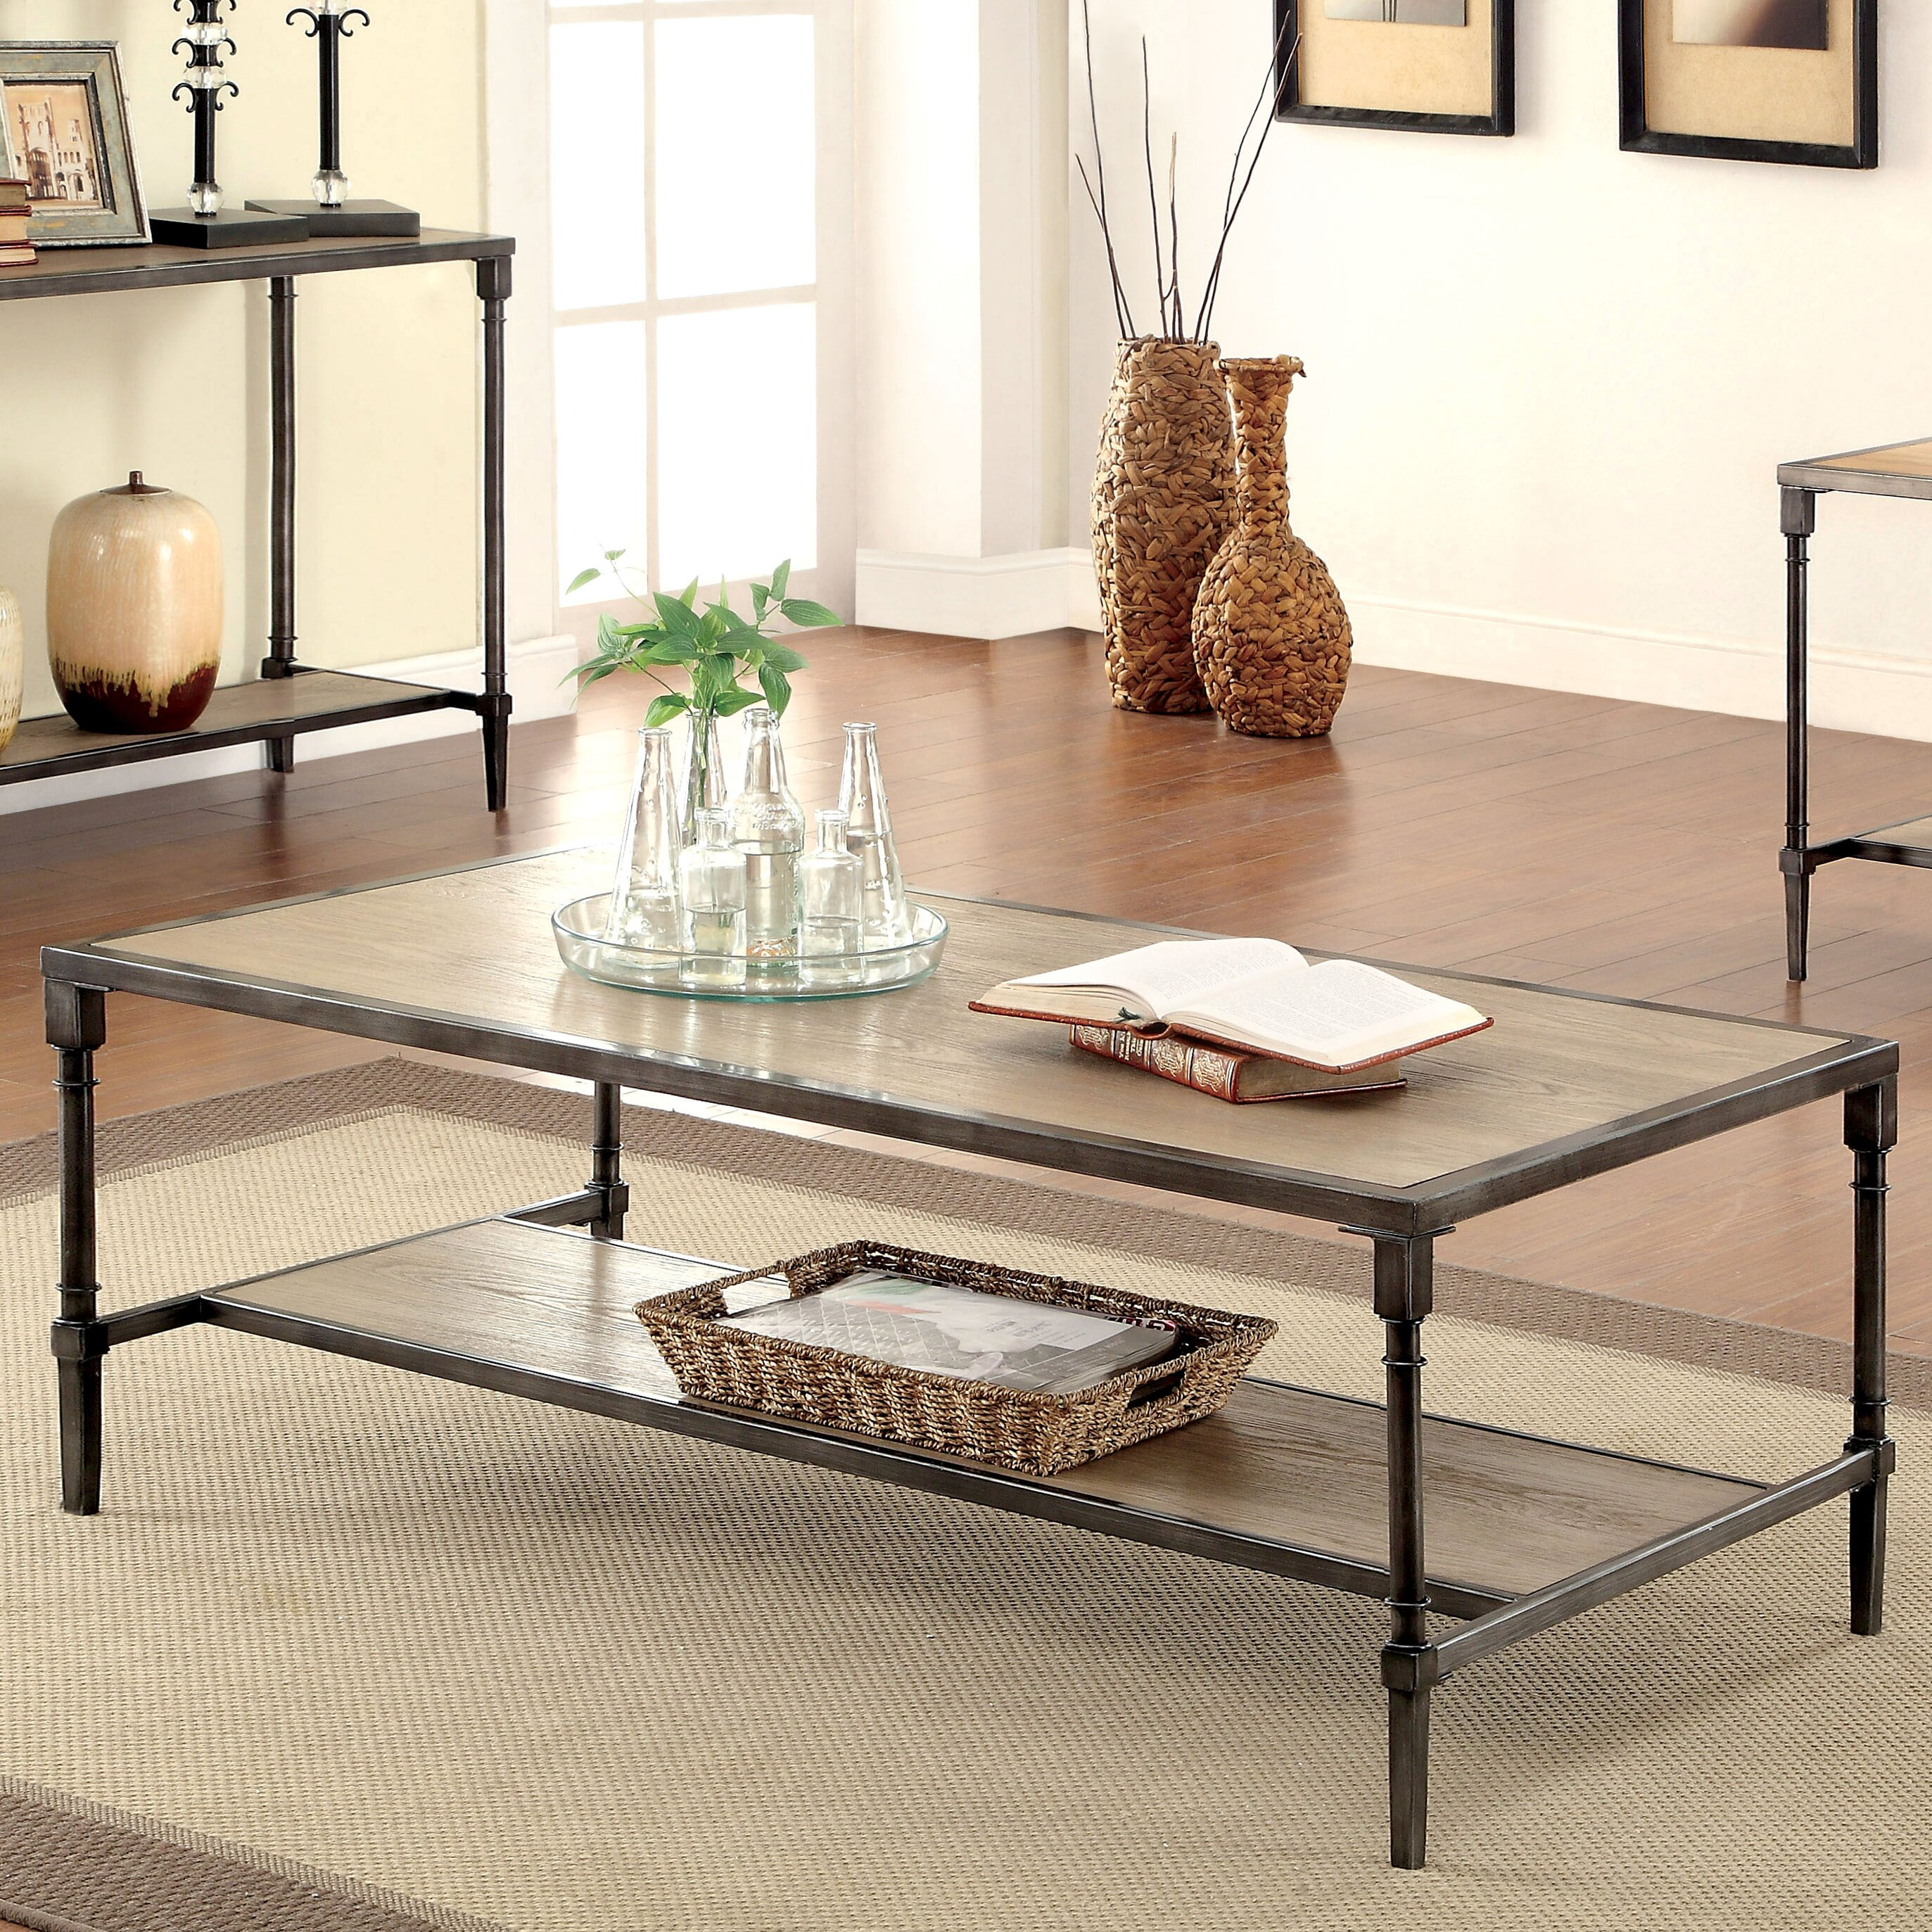 hokku designs leons coffee table reviews wayfair. Black Bedroom Furniture Sets. Home Design Ideas